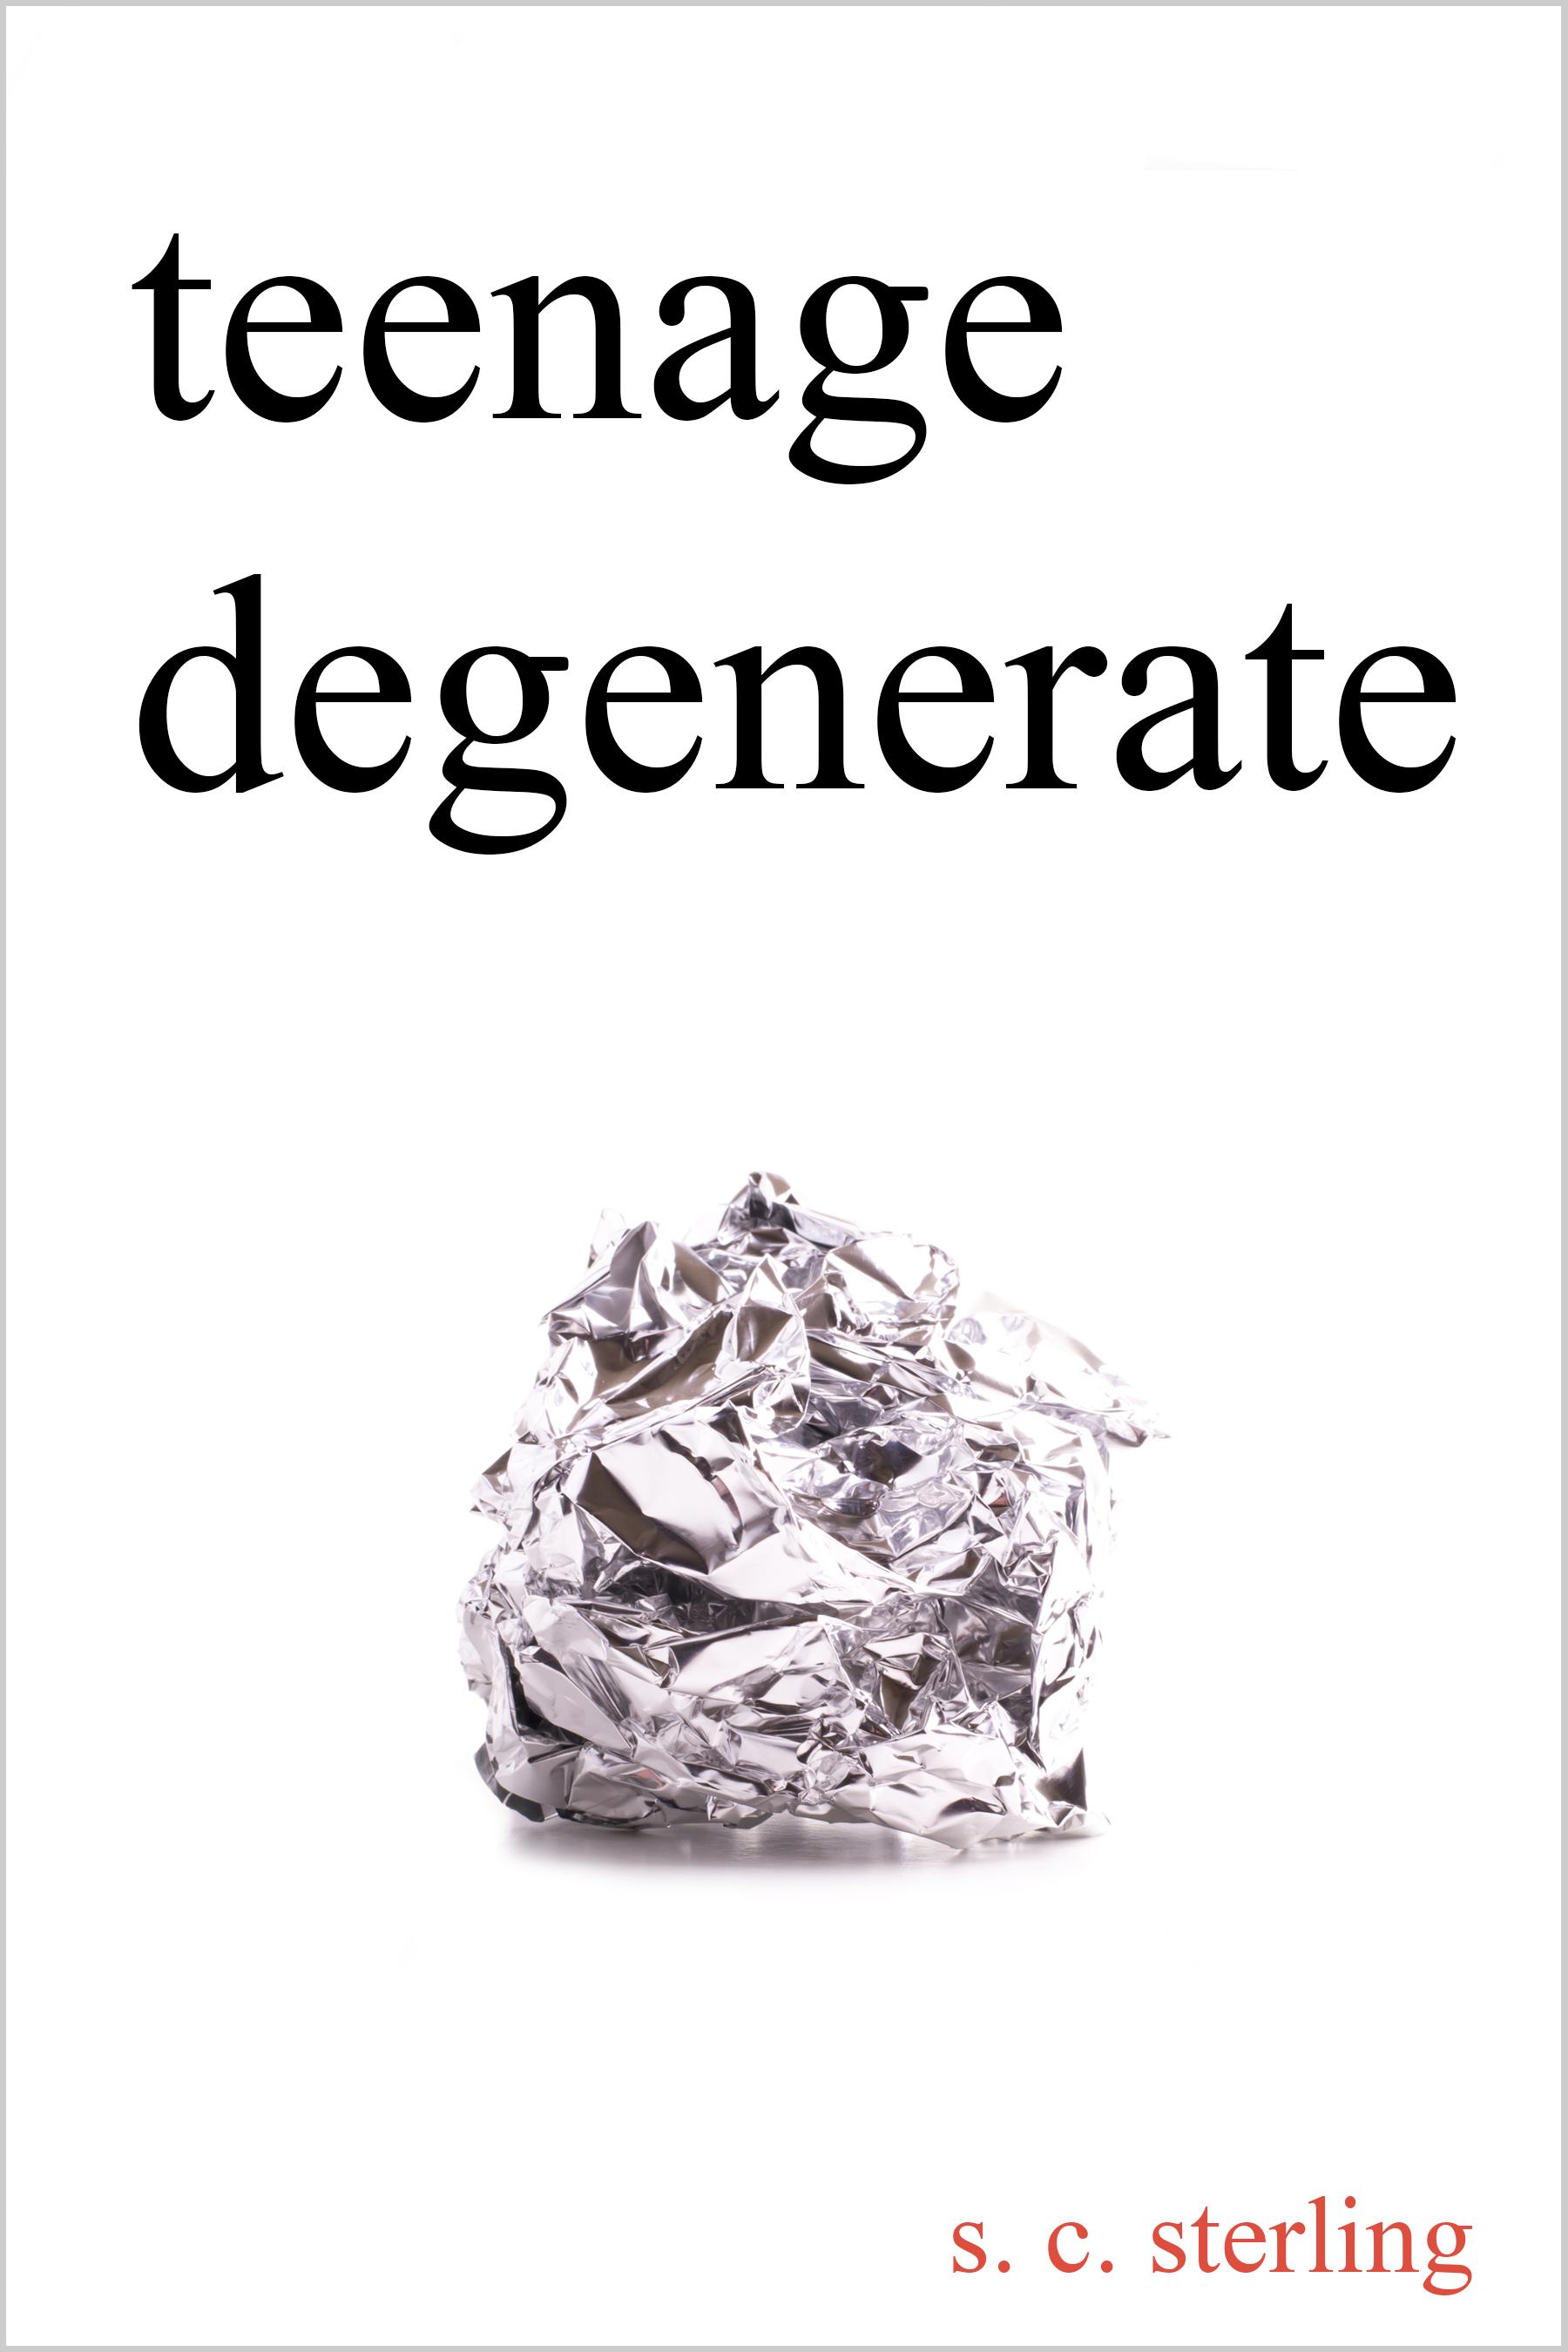 Pre-Order Teenage Degenerate on Amazon